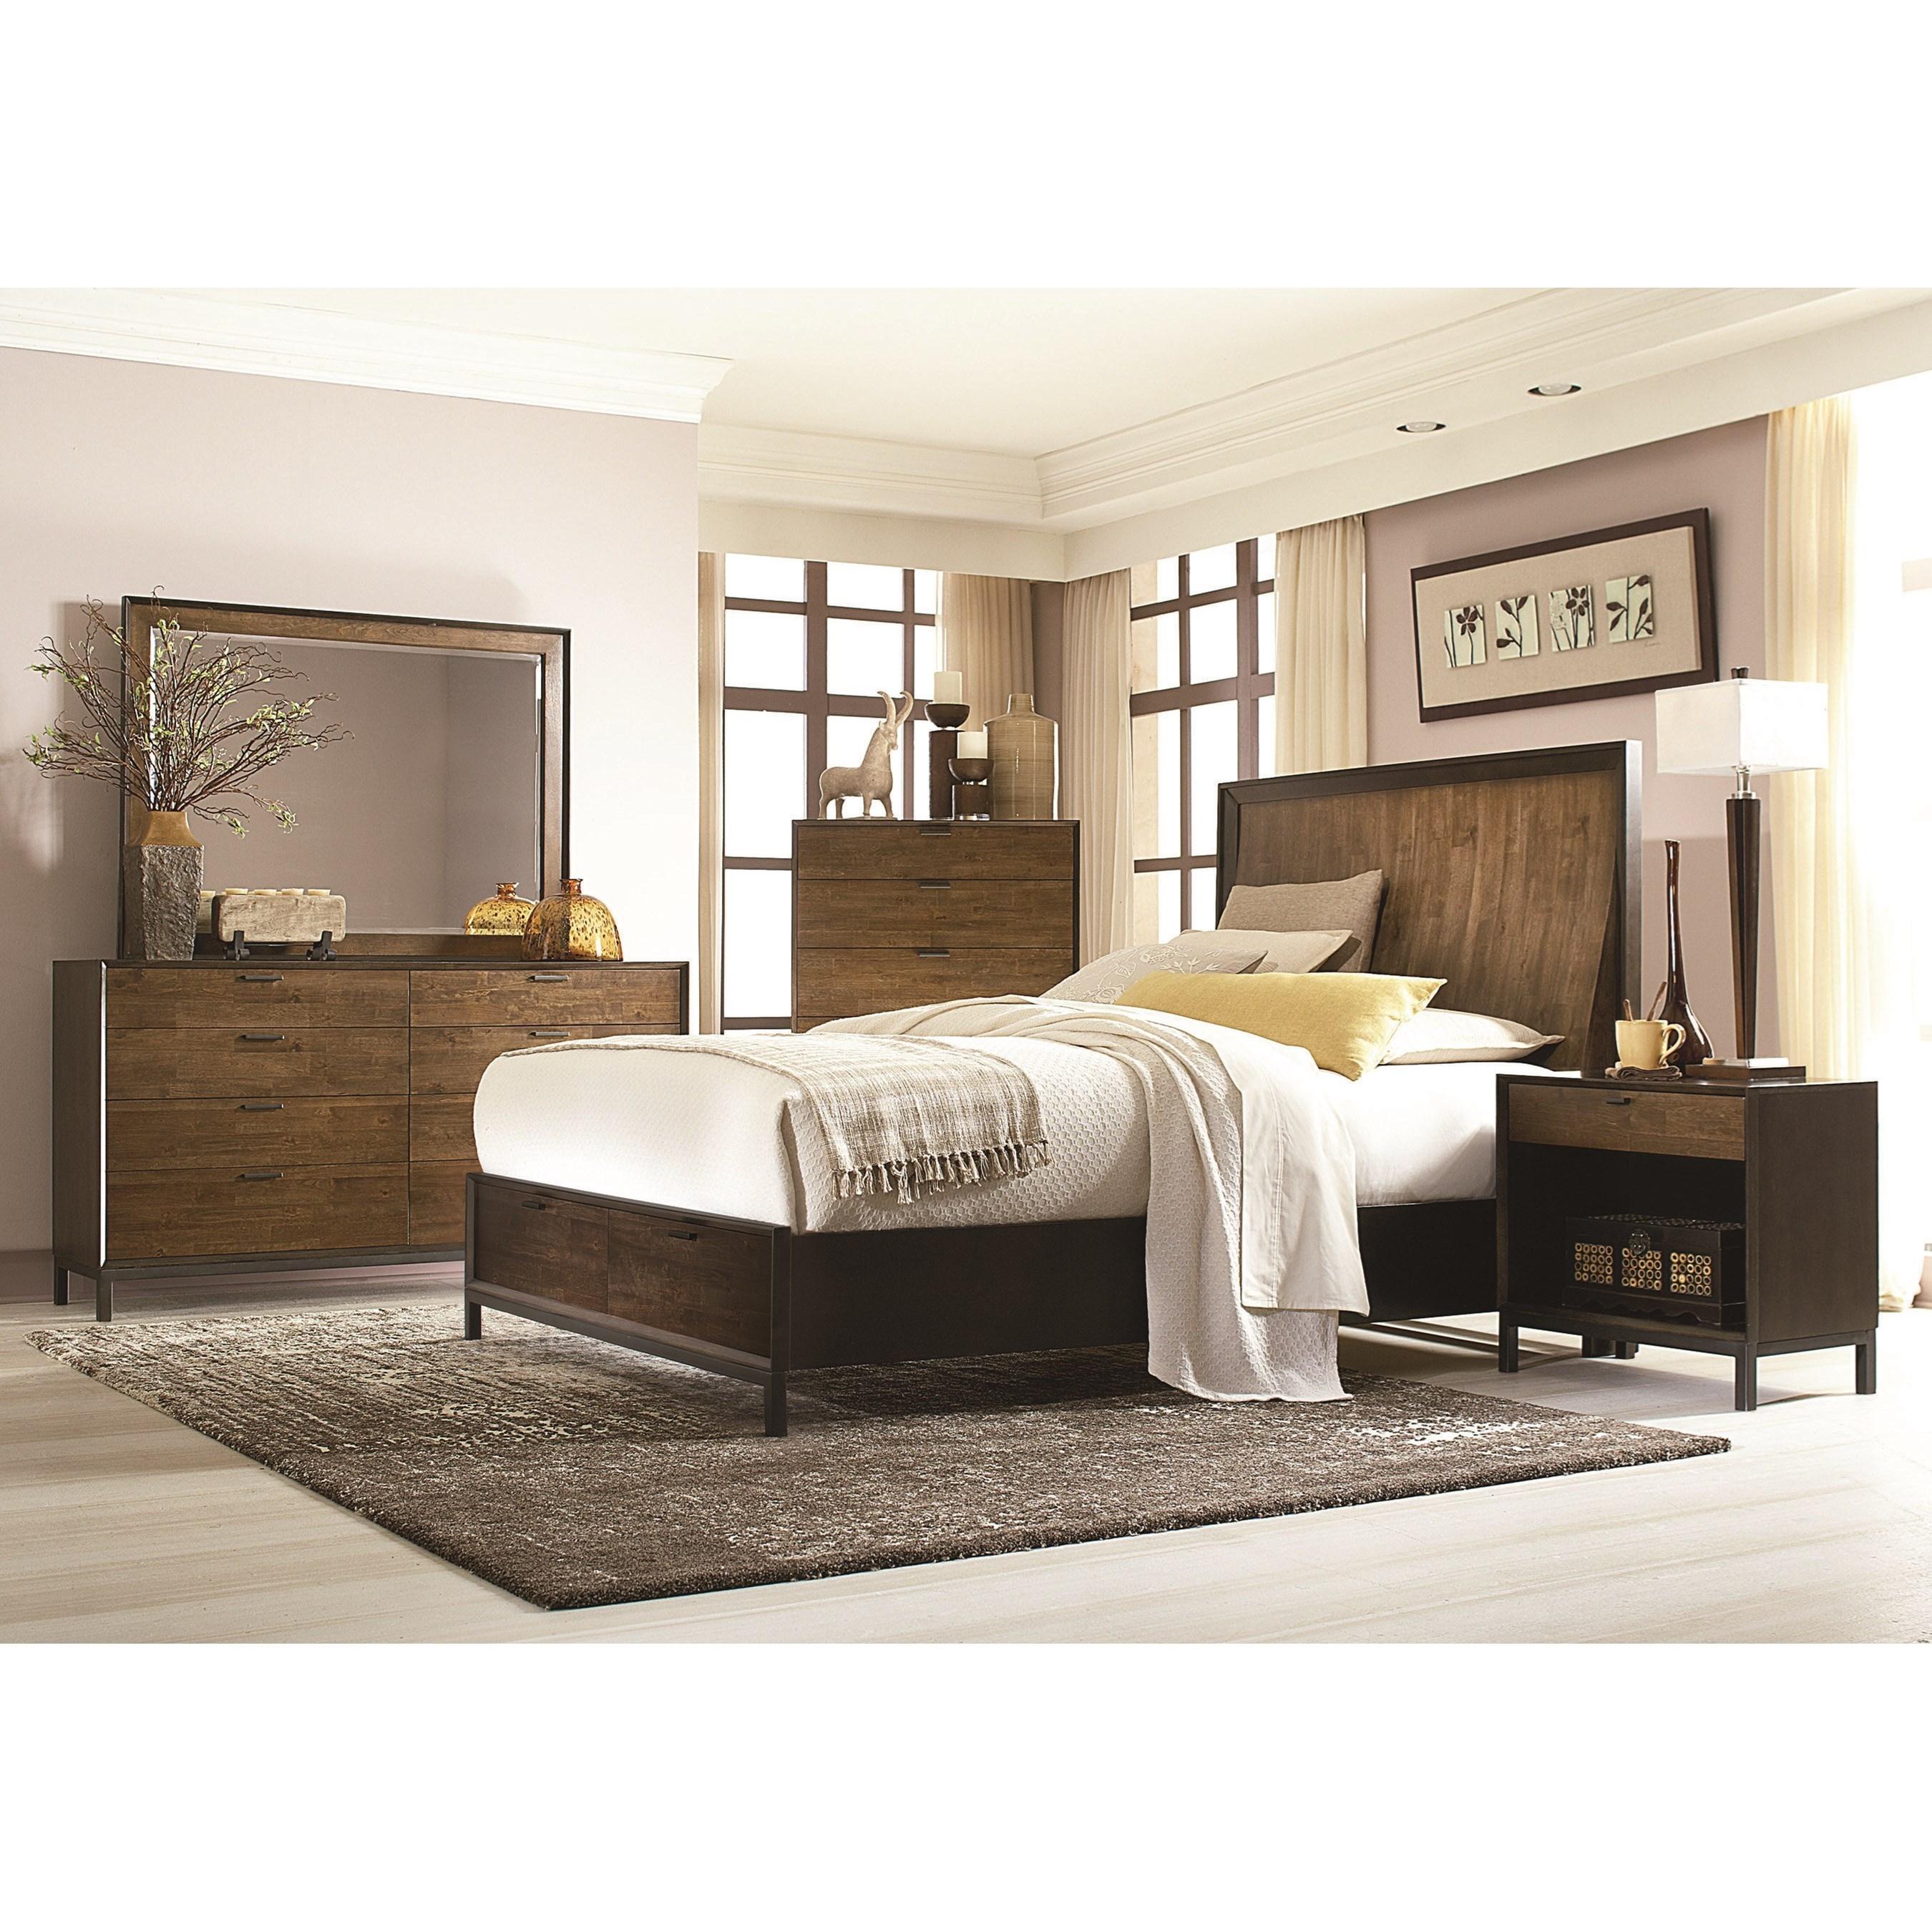 Legacy Classic Kateri King Panel Storage Bedroom Group - Item Number: 3600 K Bedroom Group 4